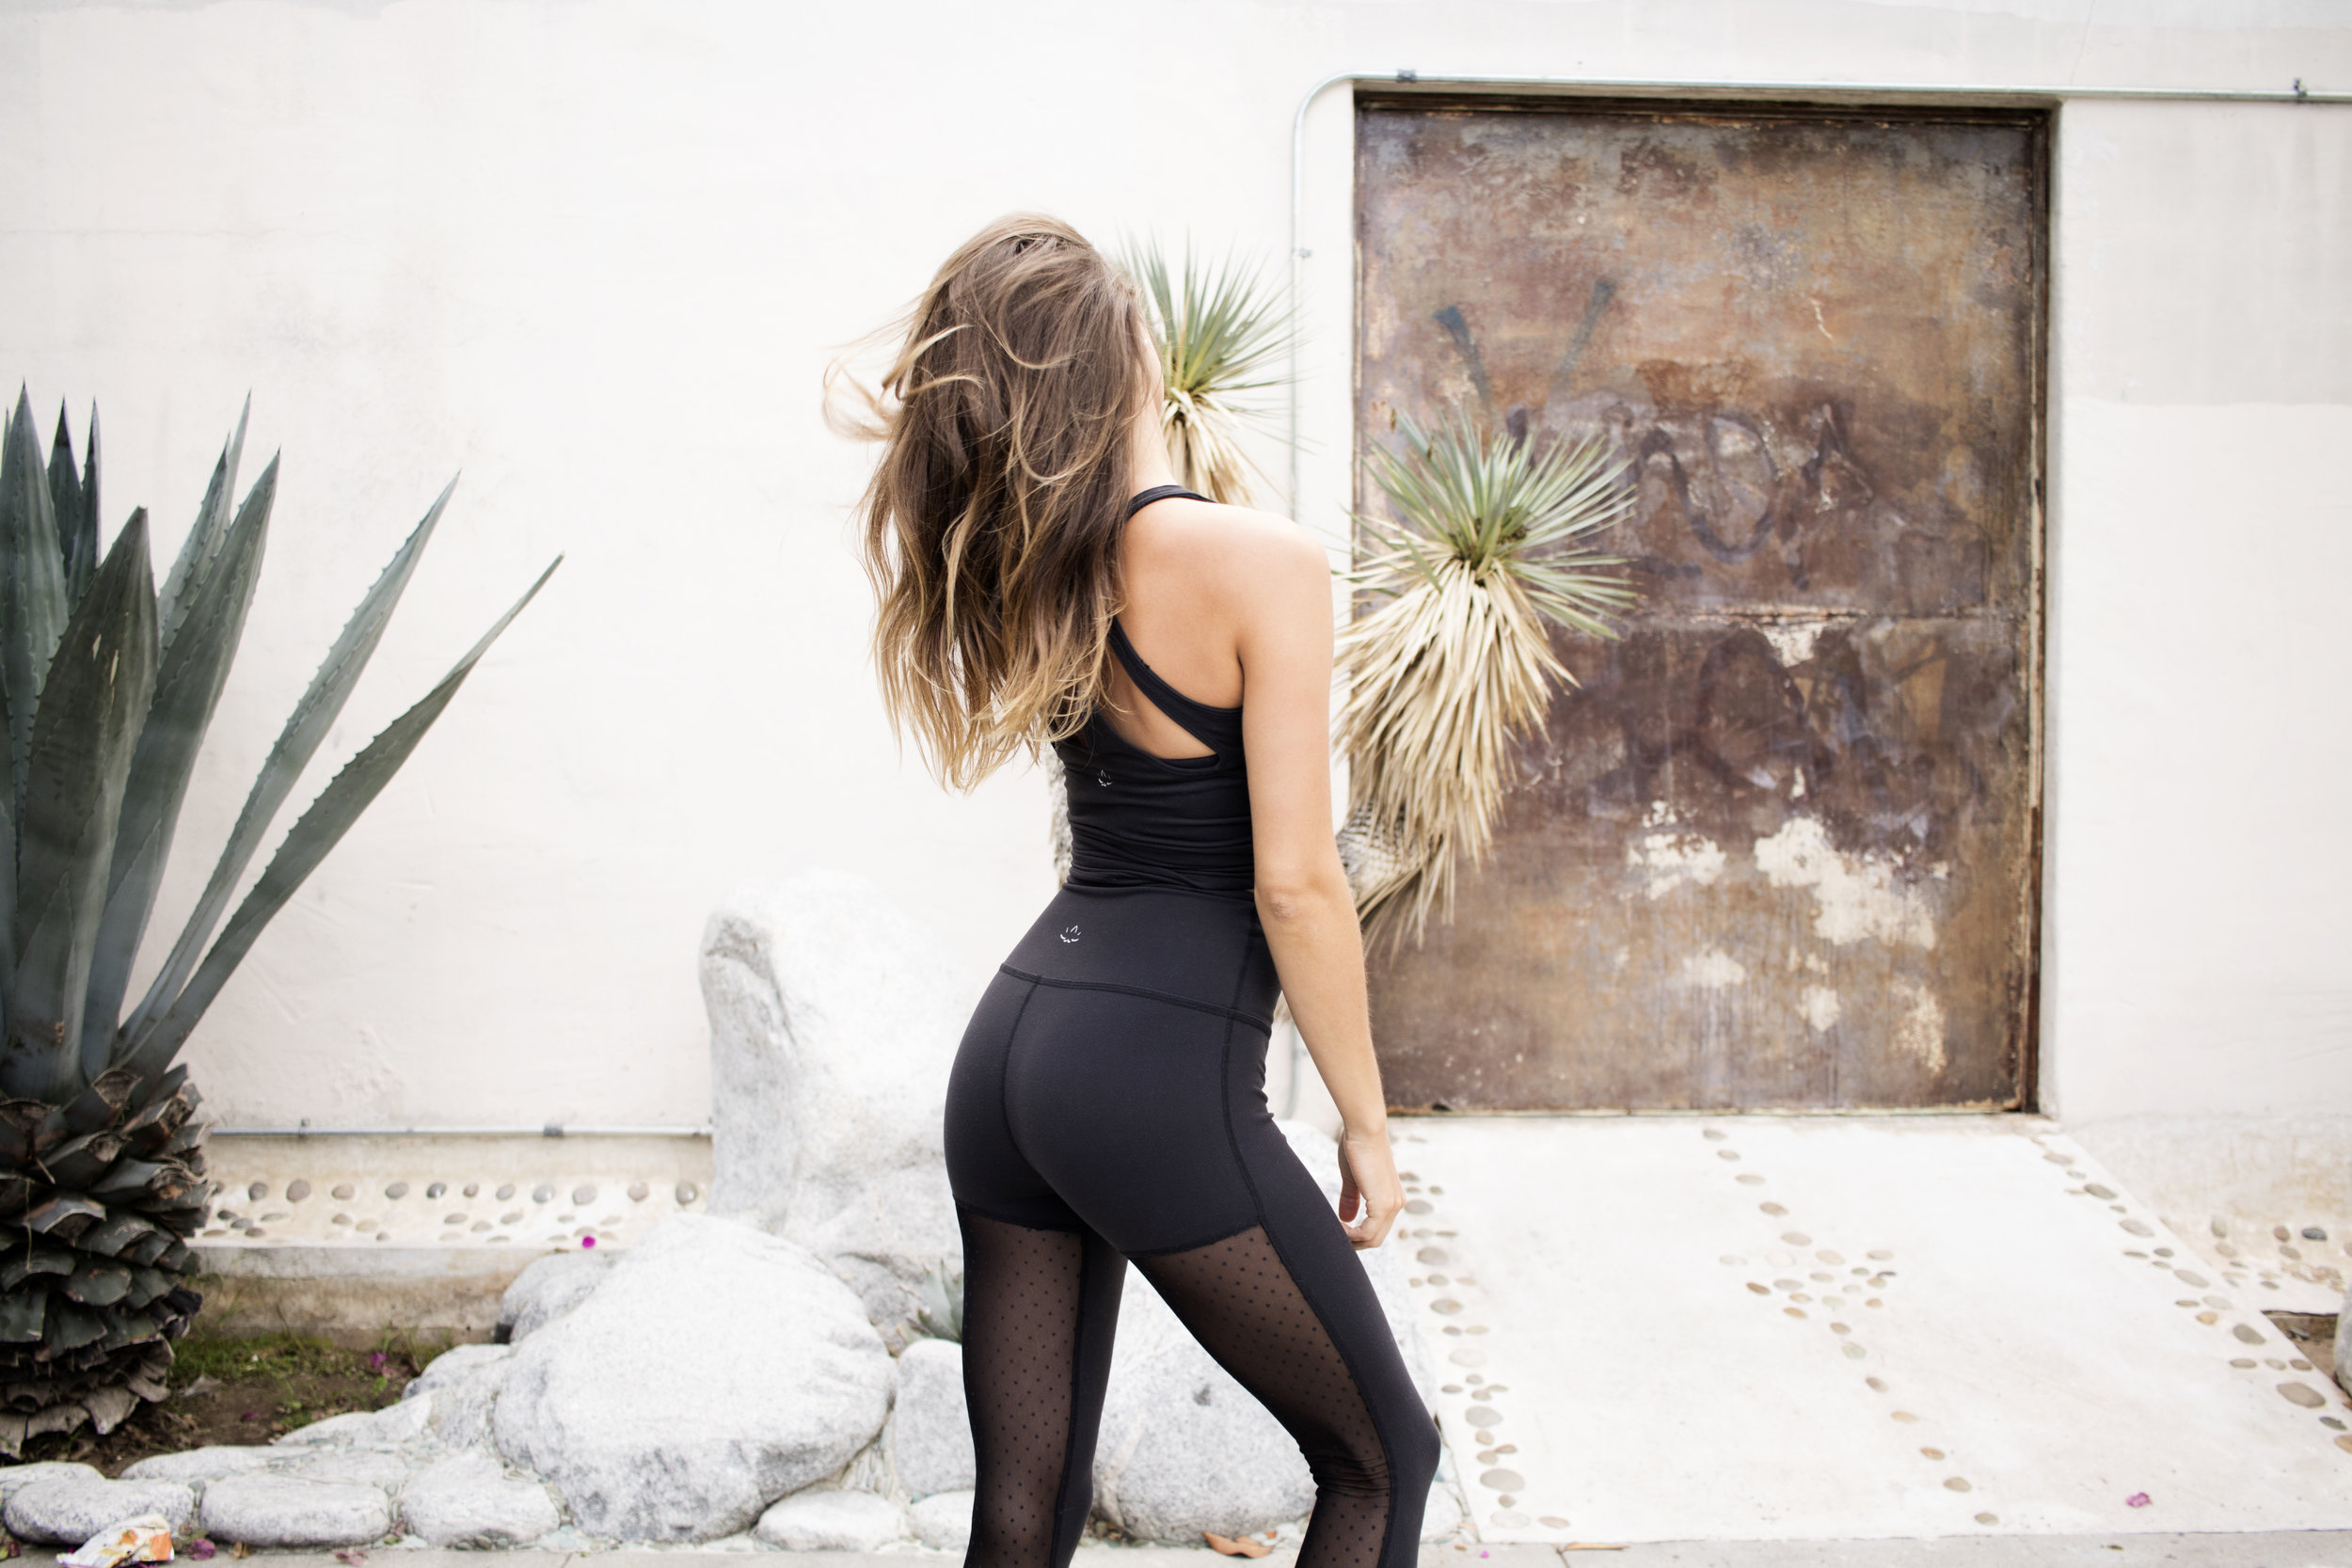 a92625102cc2b Beyond Yoga - Polka Dot Mesh High Waist Legging — The Athleisurely Life